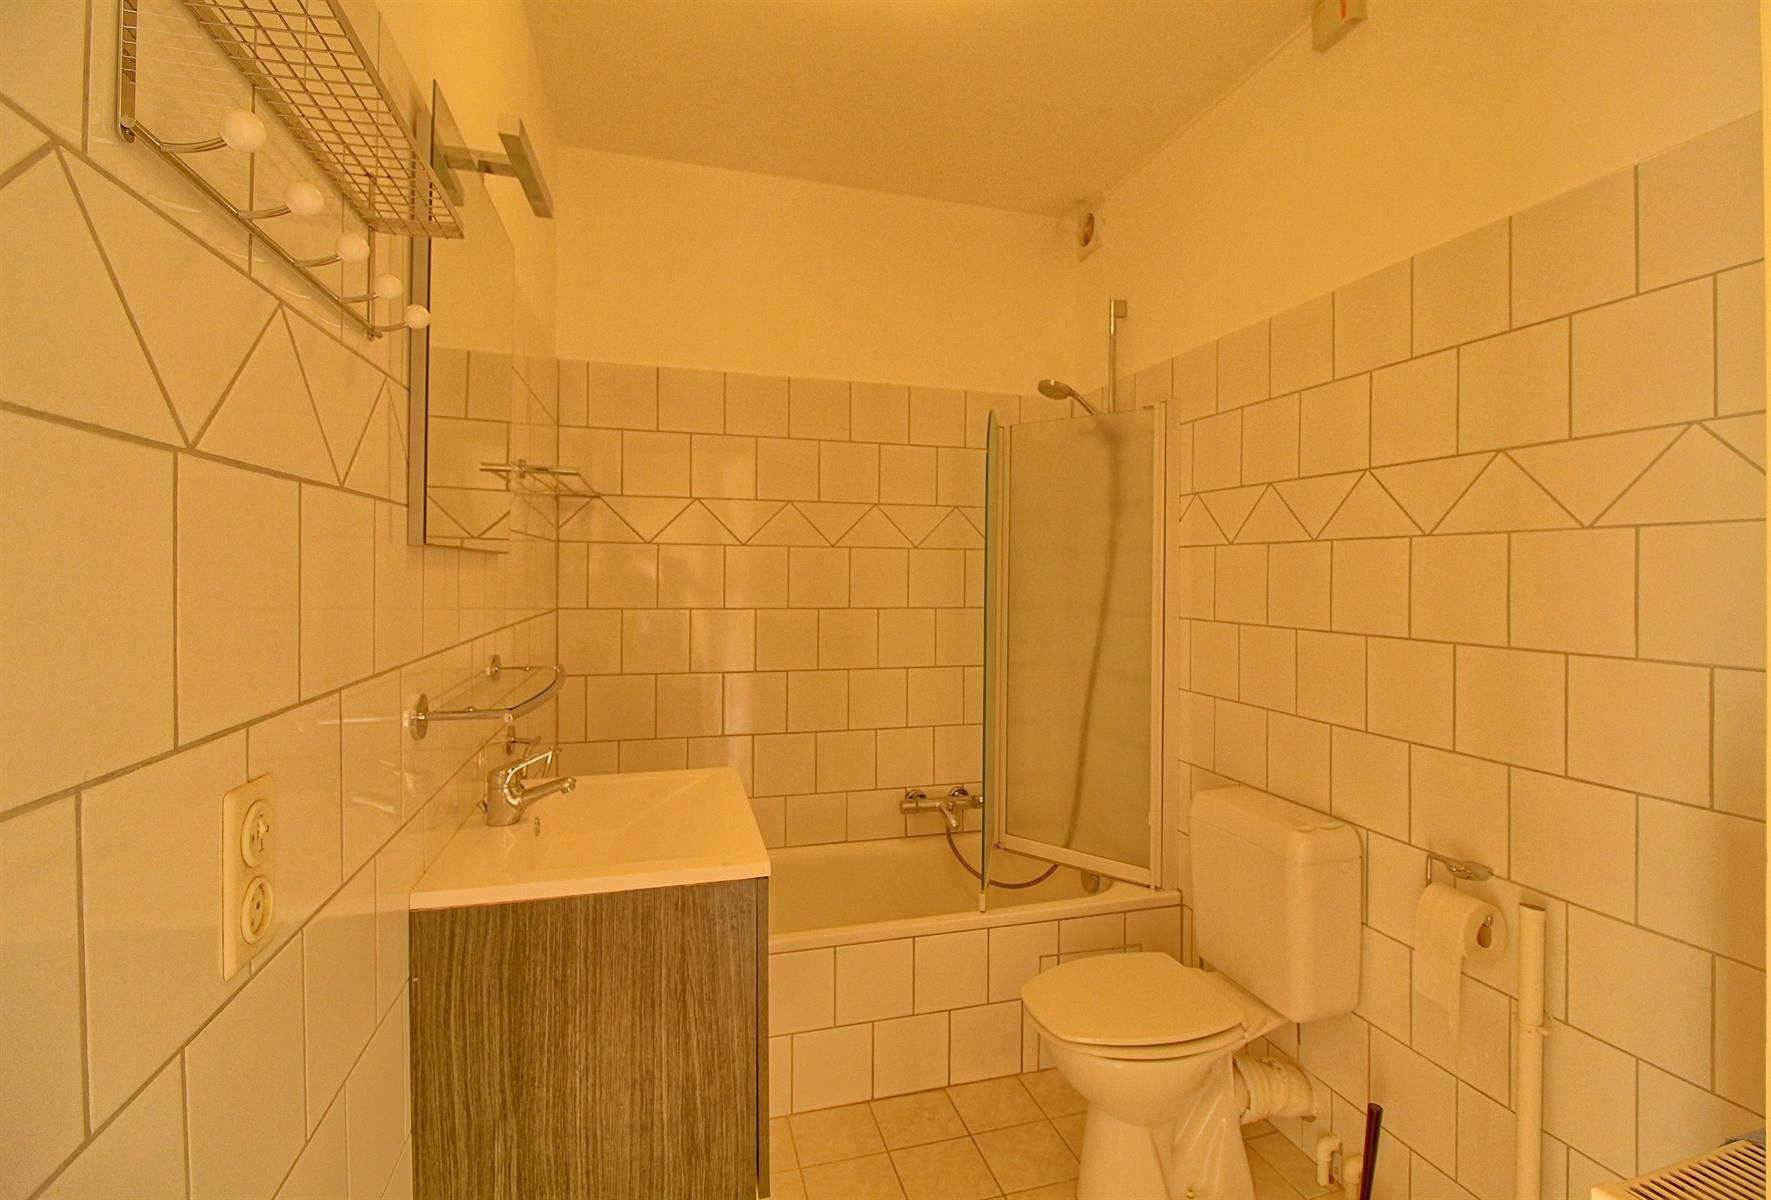 Appartement - Woluwe-Saint-Lambert - #4183448-5